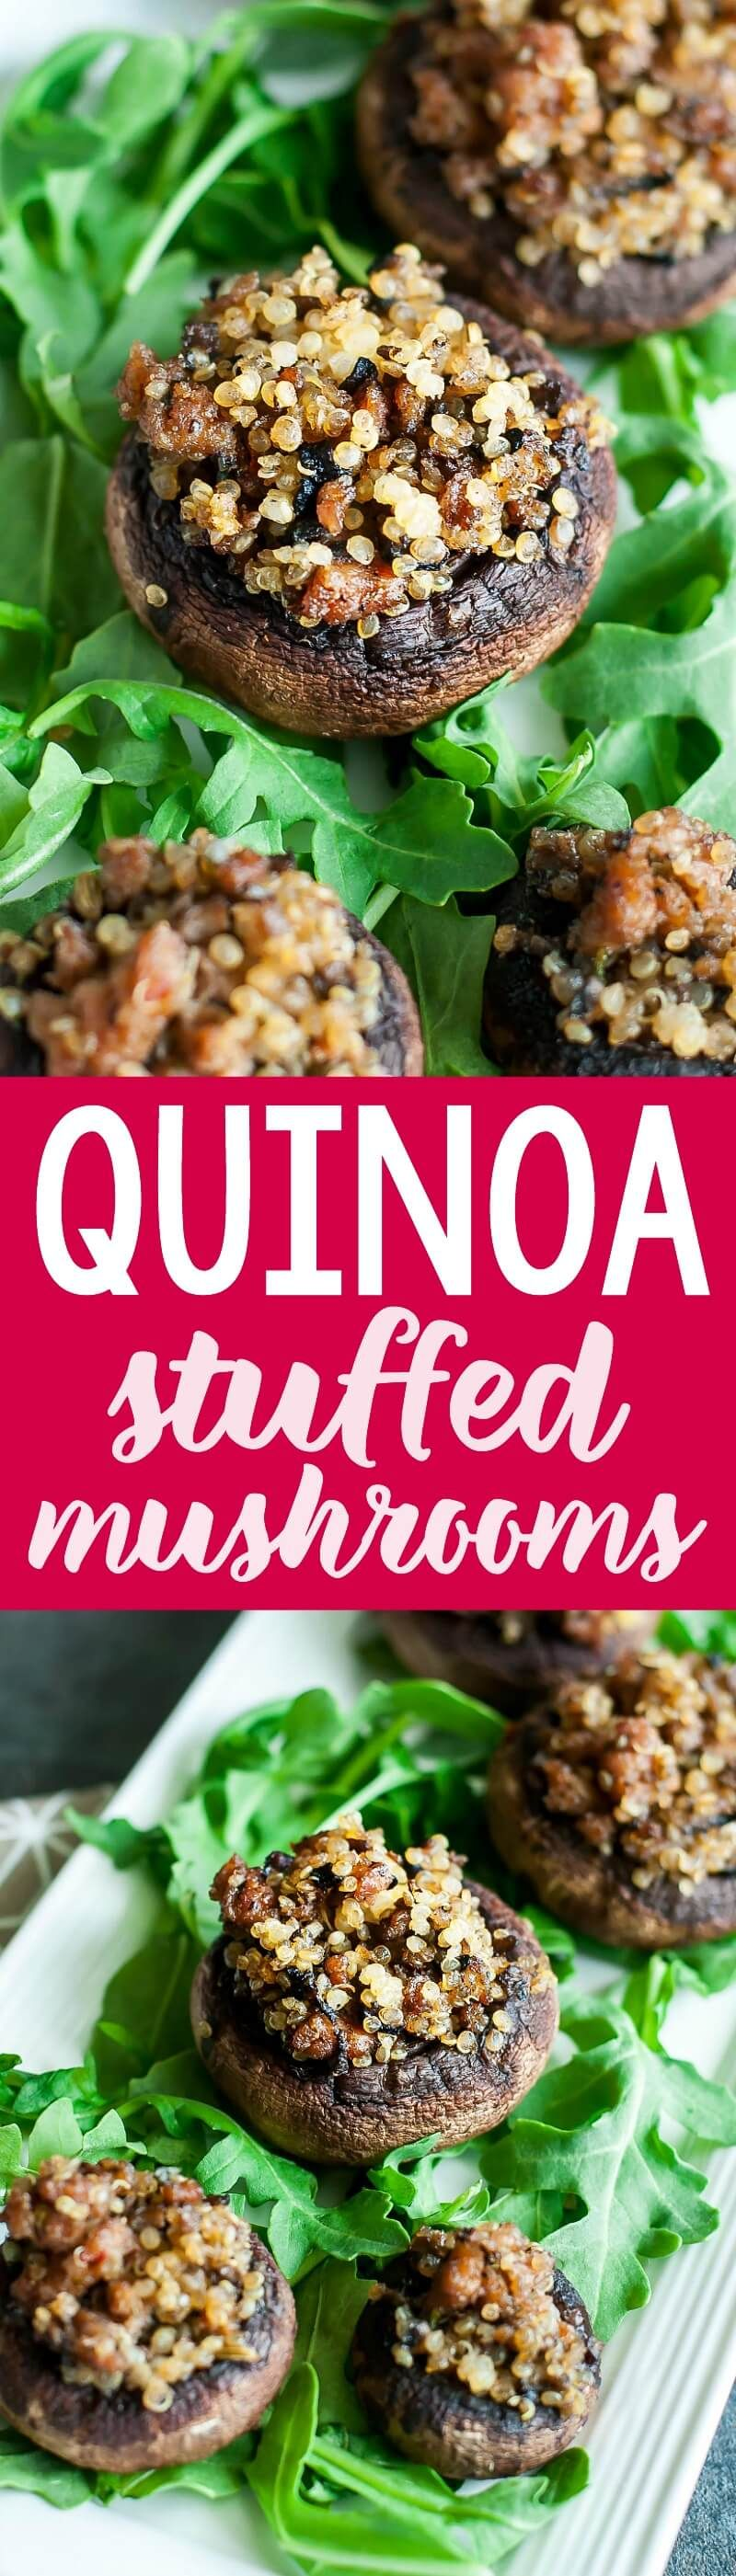 Italian sausage stuffed mushrooms with garlic and quinoa